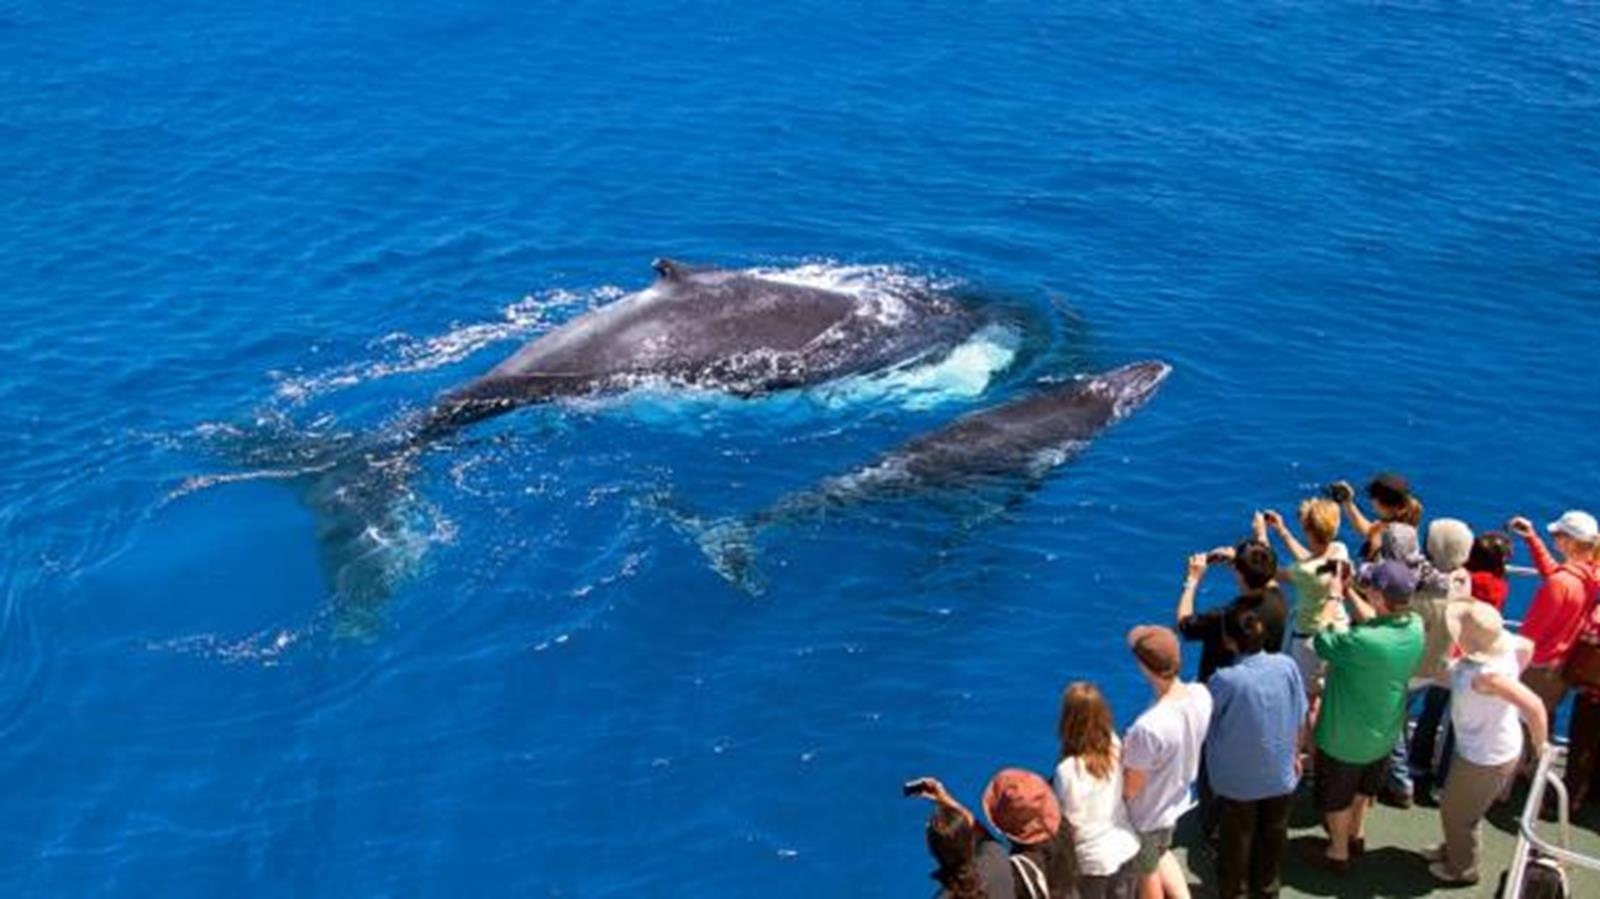 Credit http://www.australia.com/content/australia/en/articles/nat-whalewatching/_jcr_content/mainParsys/largeimagewithtext_1/imageSrc.adapt.609.medium.jpg